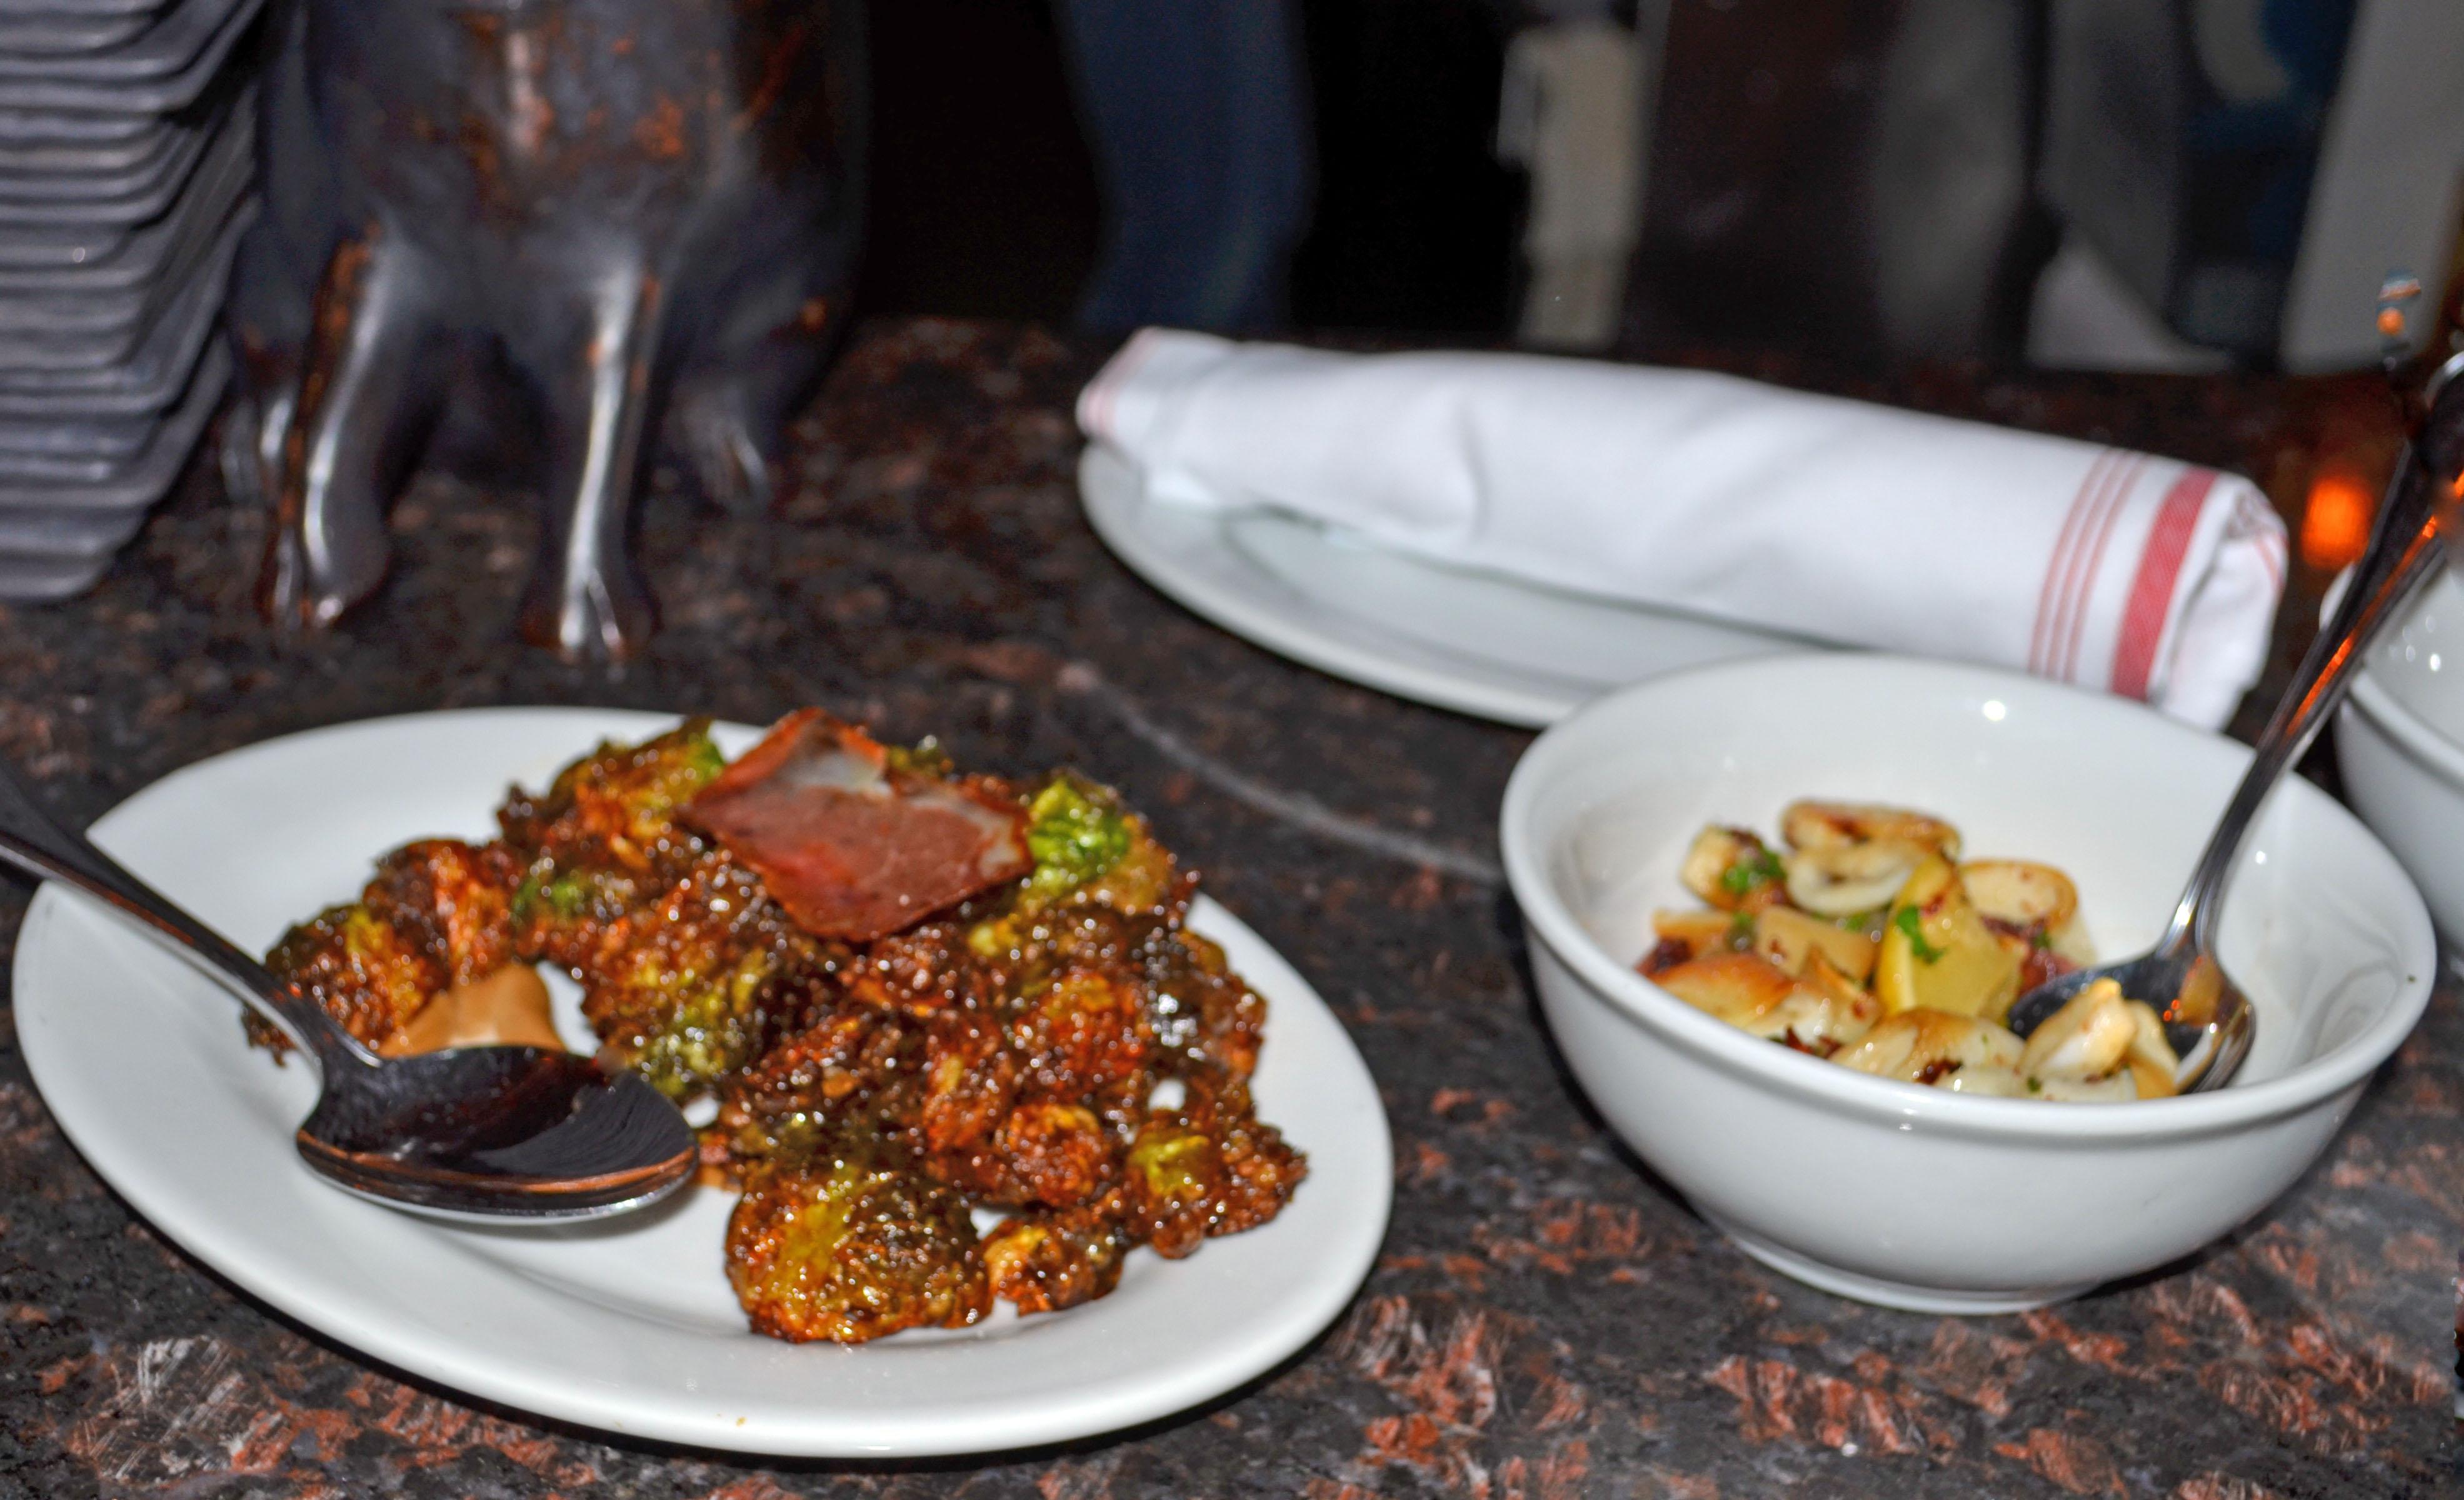 Birroteca's crispy brussels sprouts and tender calamari. (Photo by Francine Halvorsen)